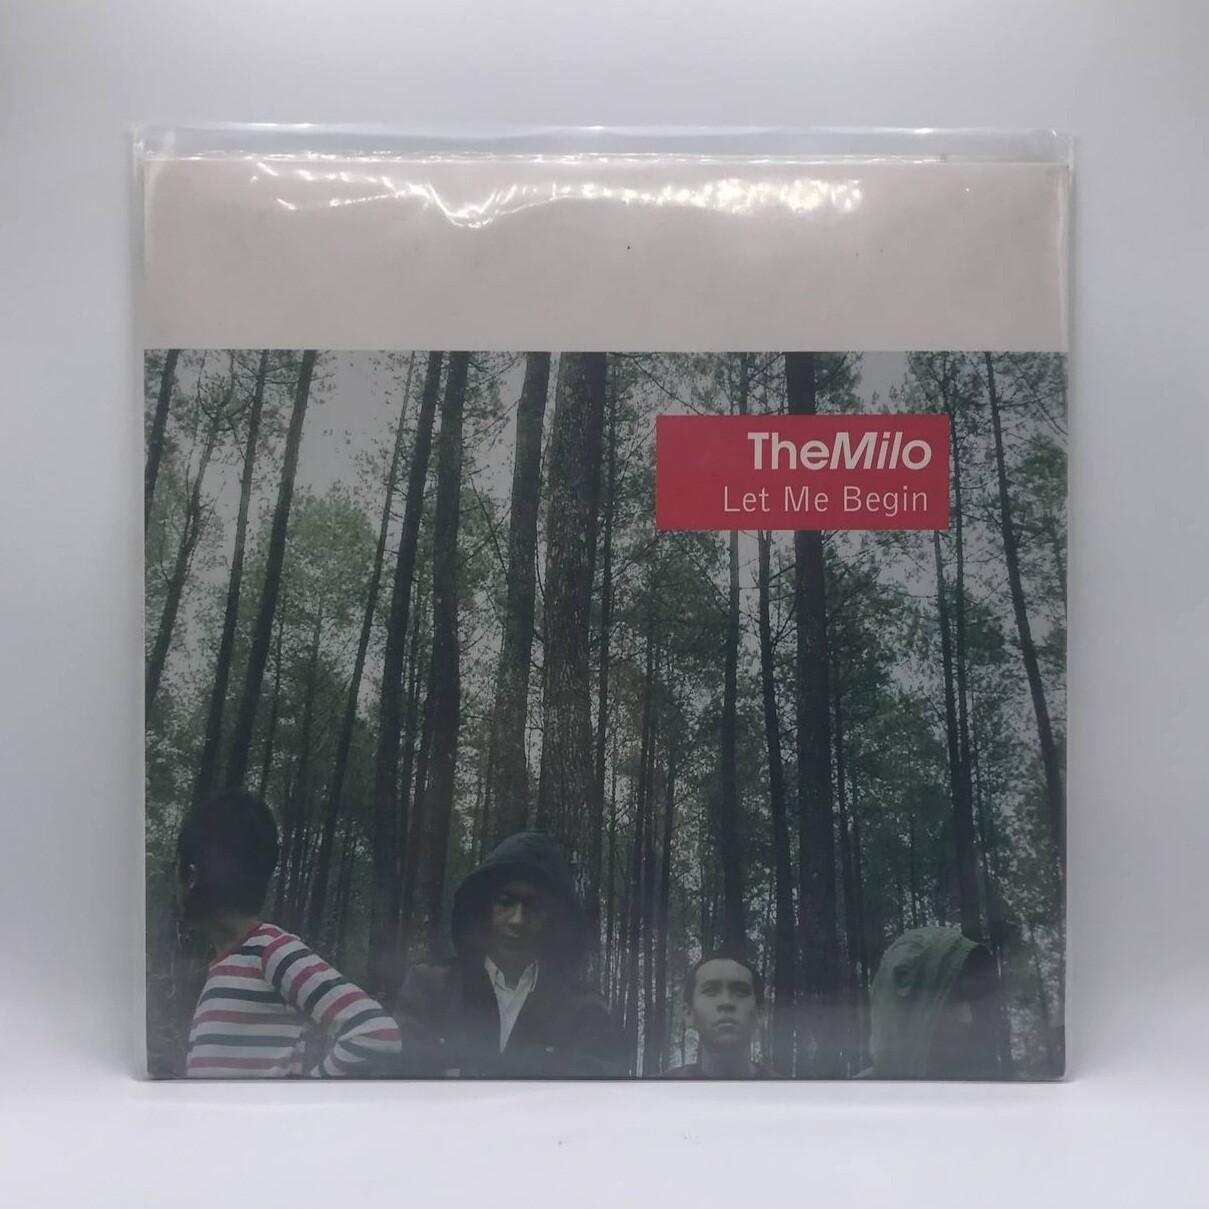 [USED] THE MILO -LET ME BEGIN- LP